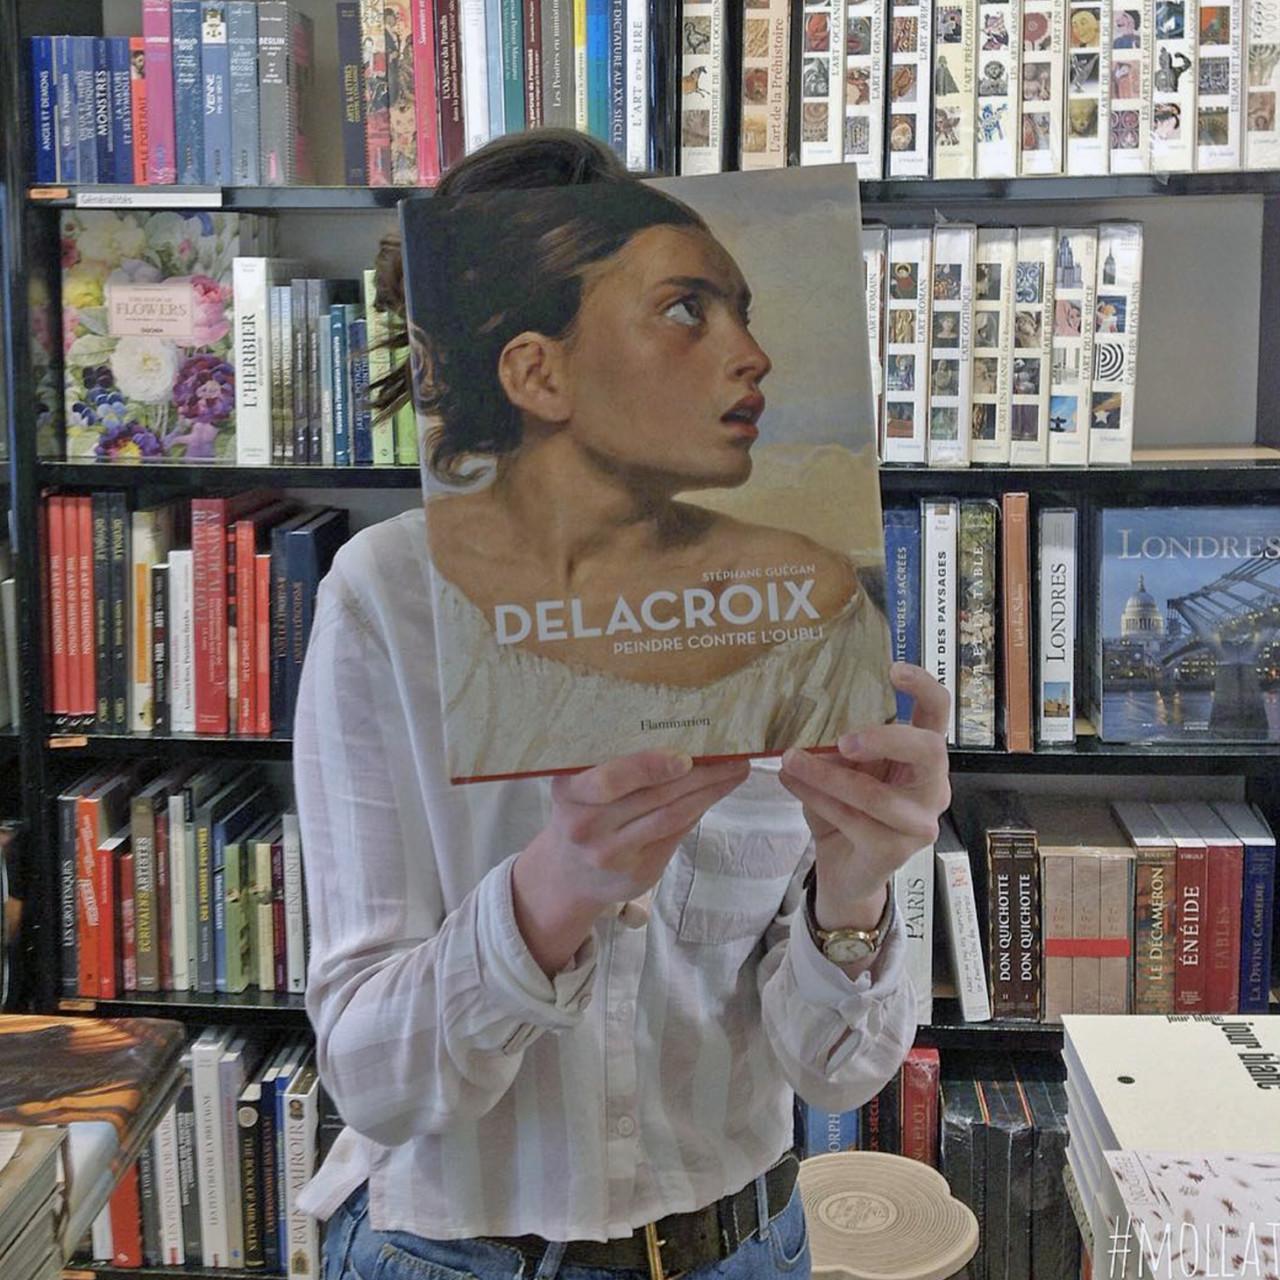 bookstore-1-640x640@2x